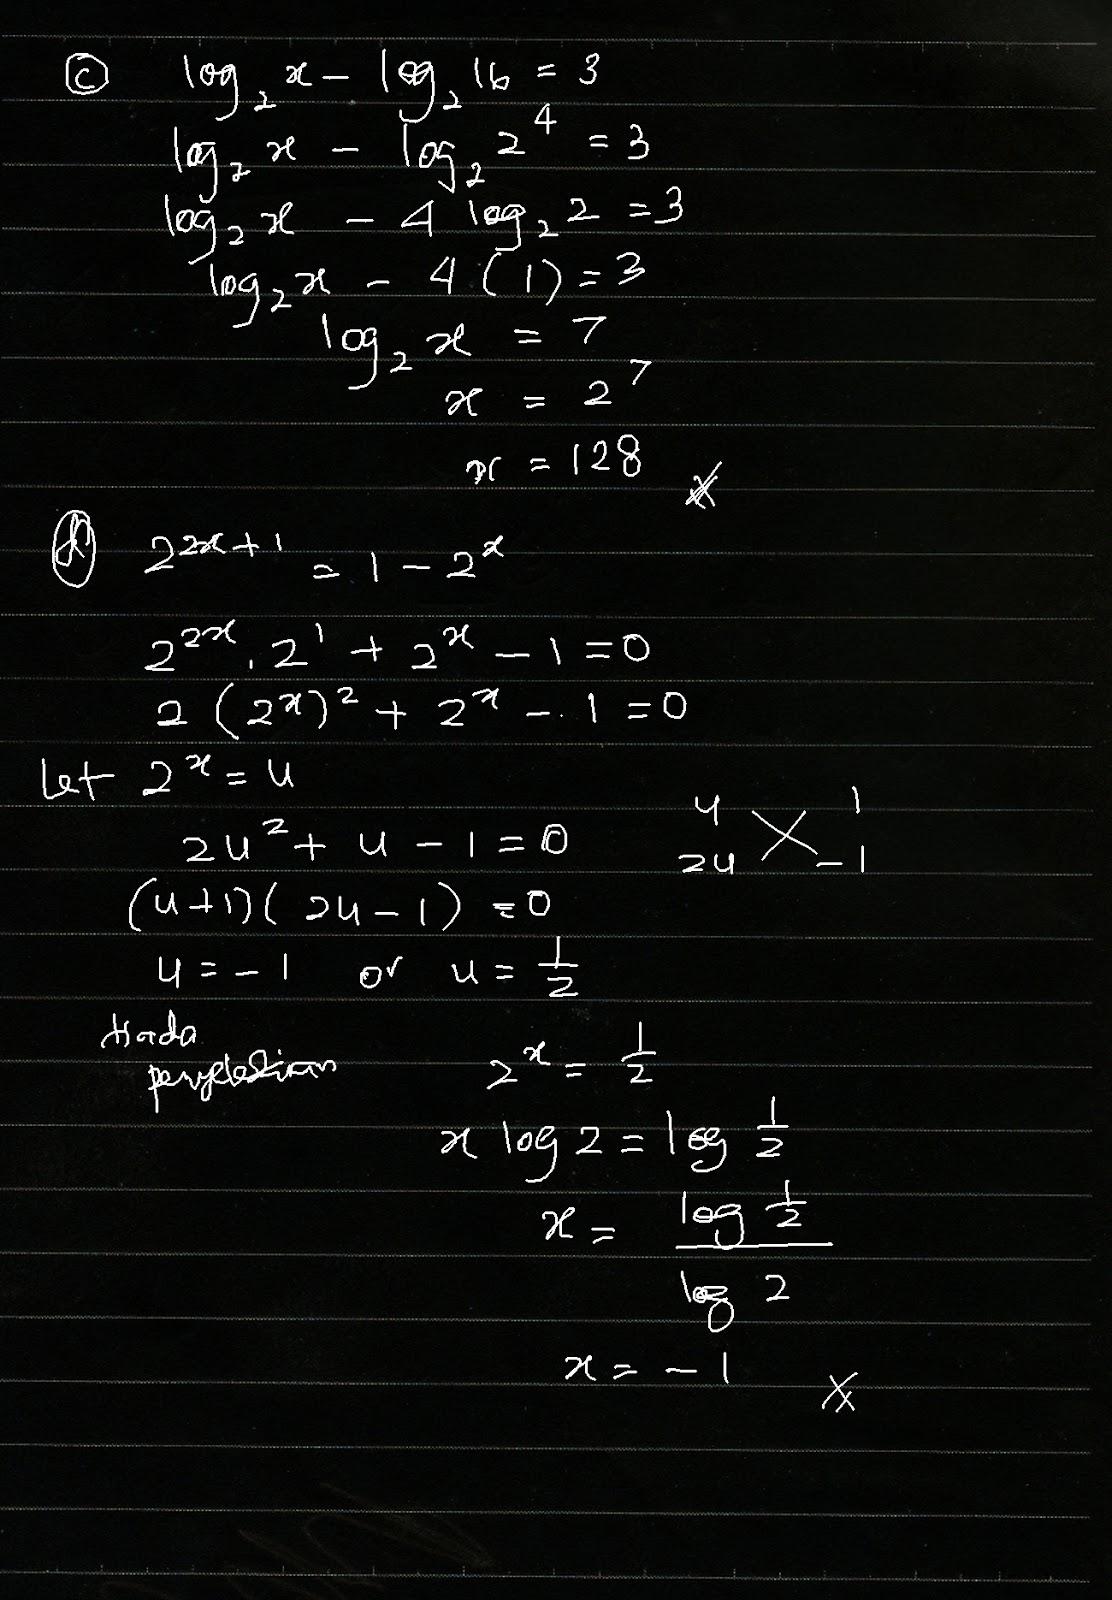 Jawapan Buku Teks Matematik Tingkatan 2 Kssm - Contoh O